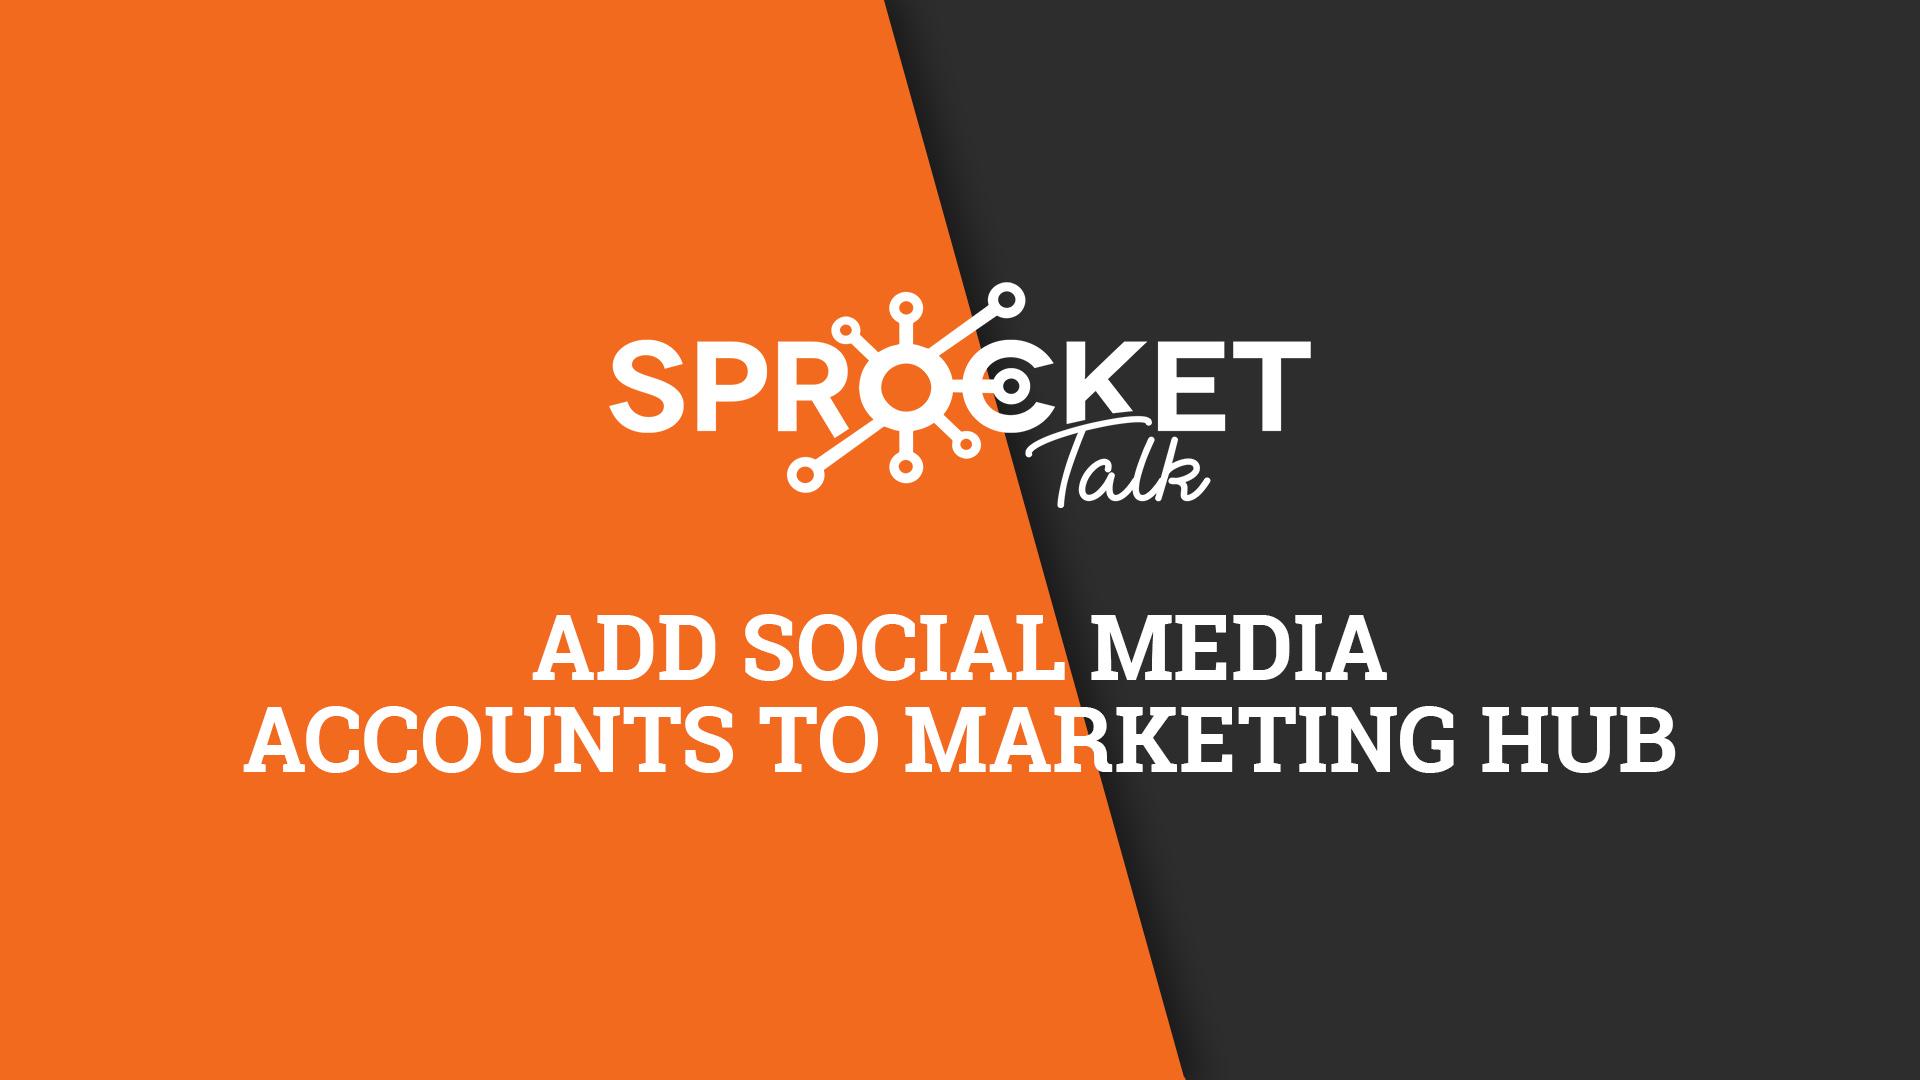 Add Social Media Accounts to Marketing Hub